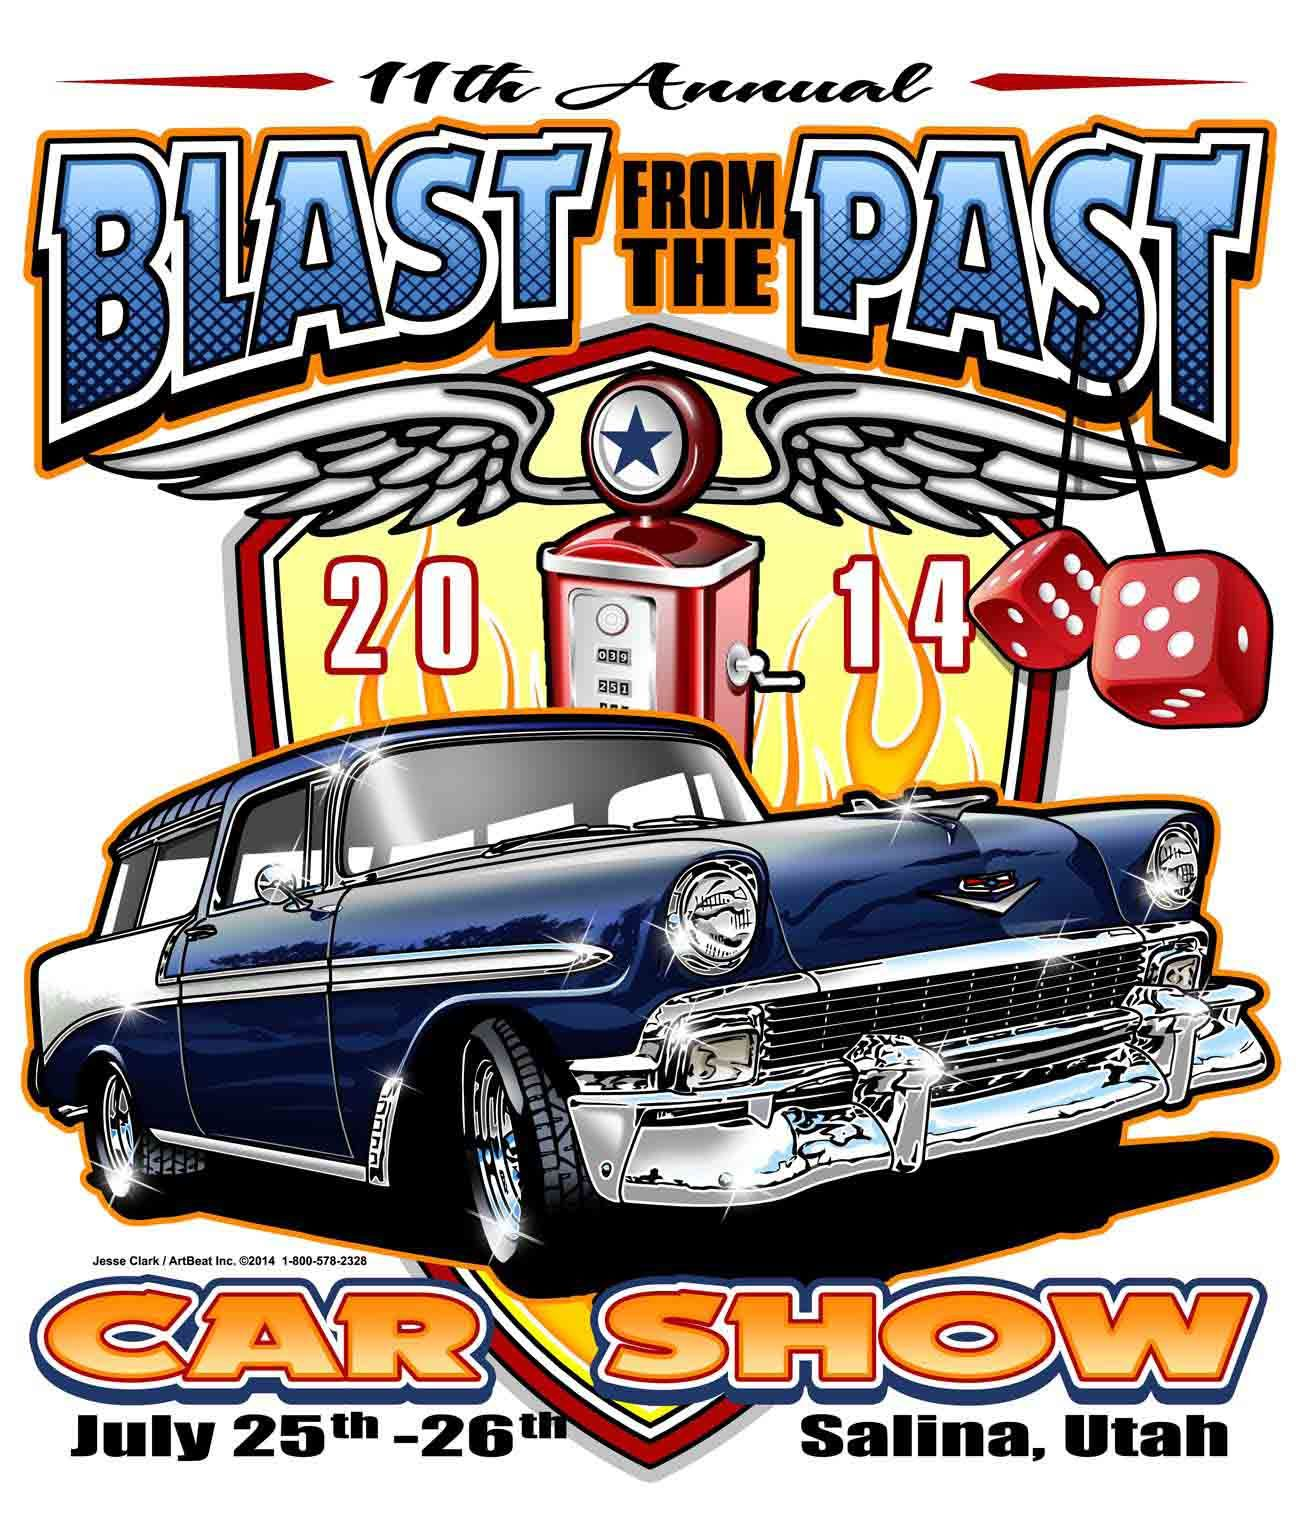 2014 Blast From The Past Car Show- Salina, Utah/ July 25